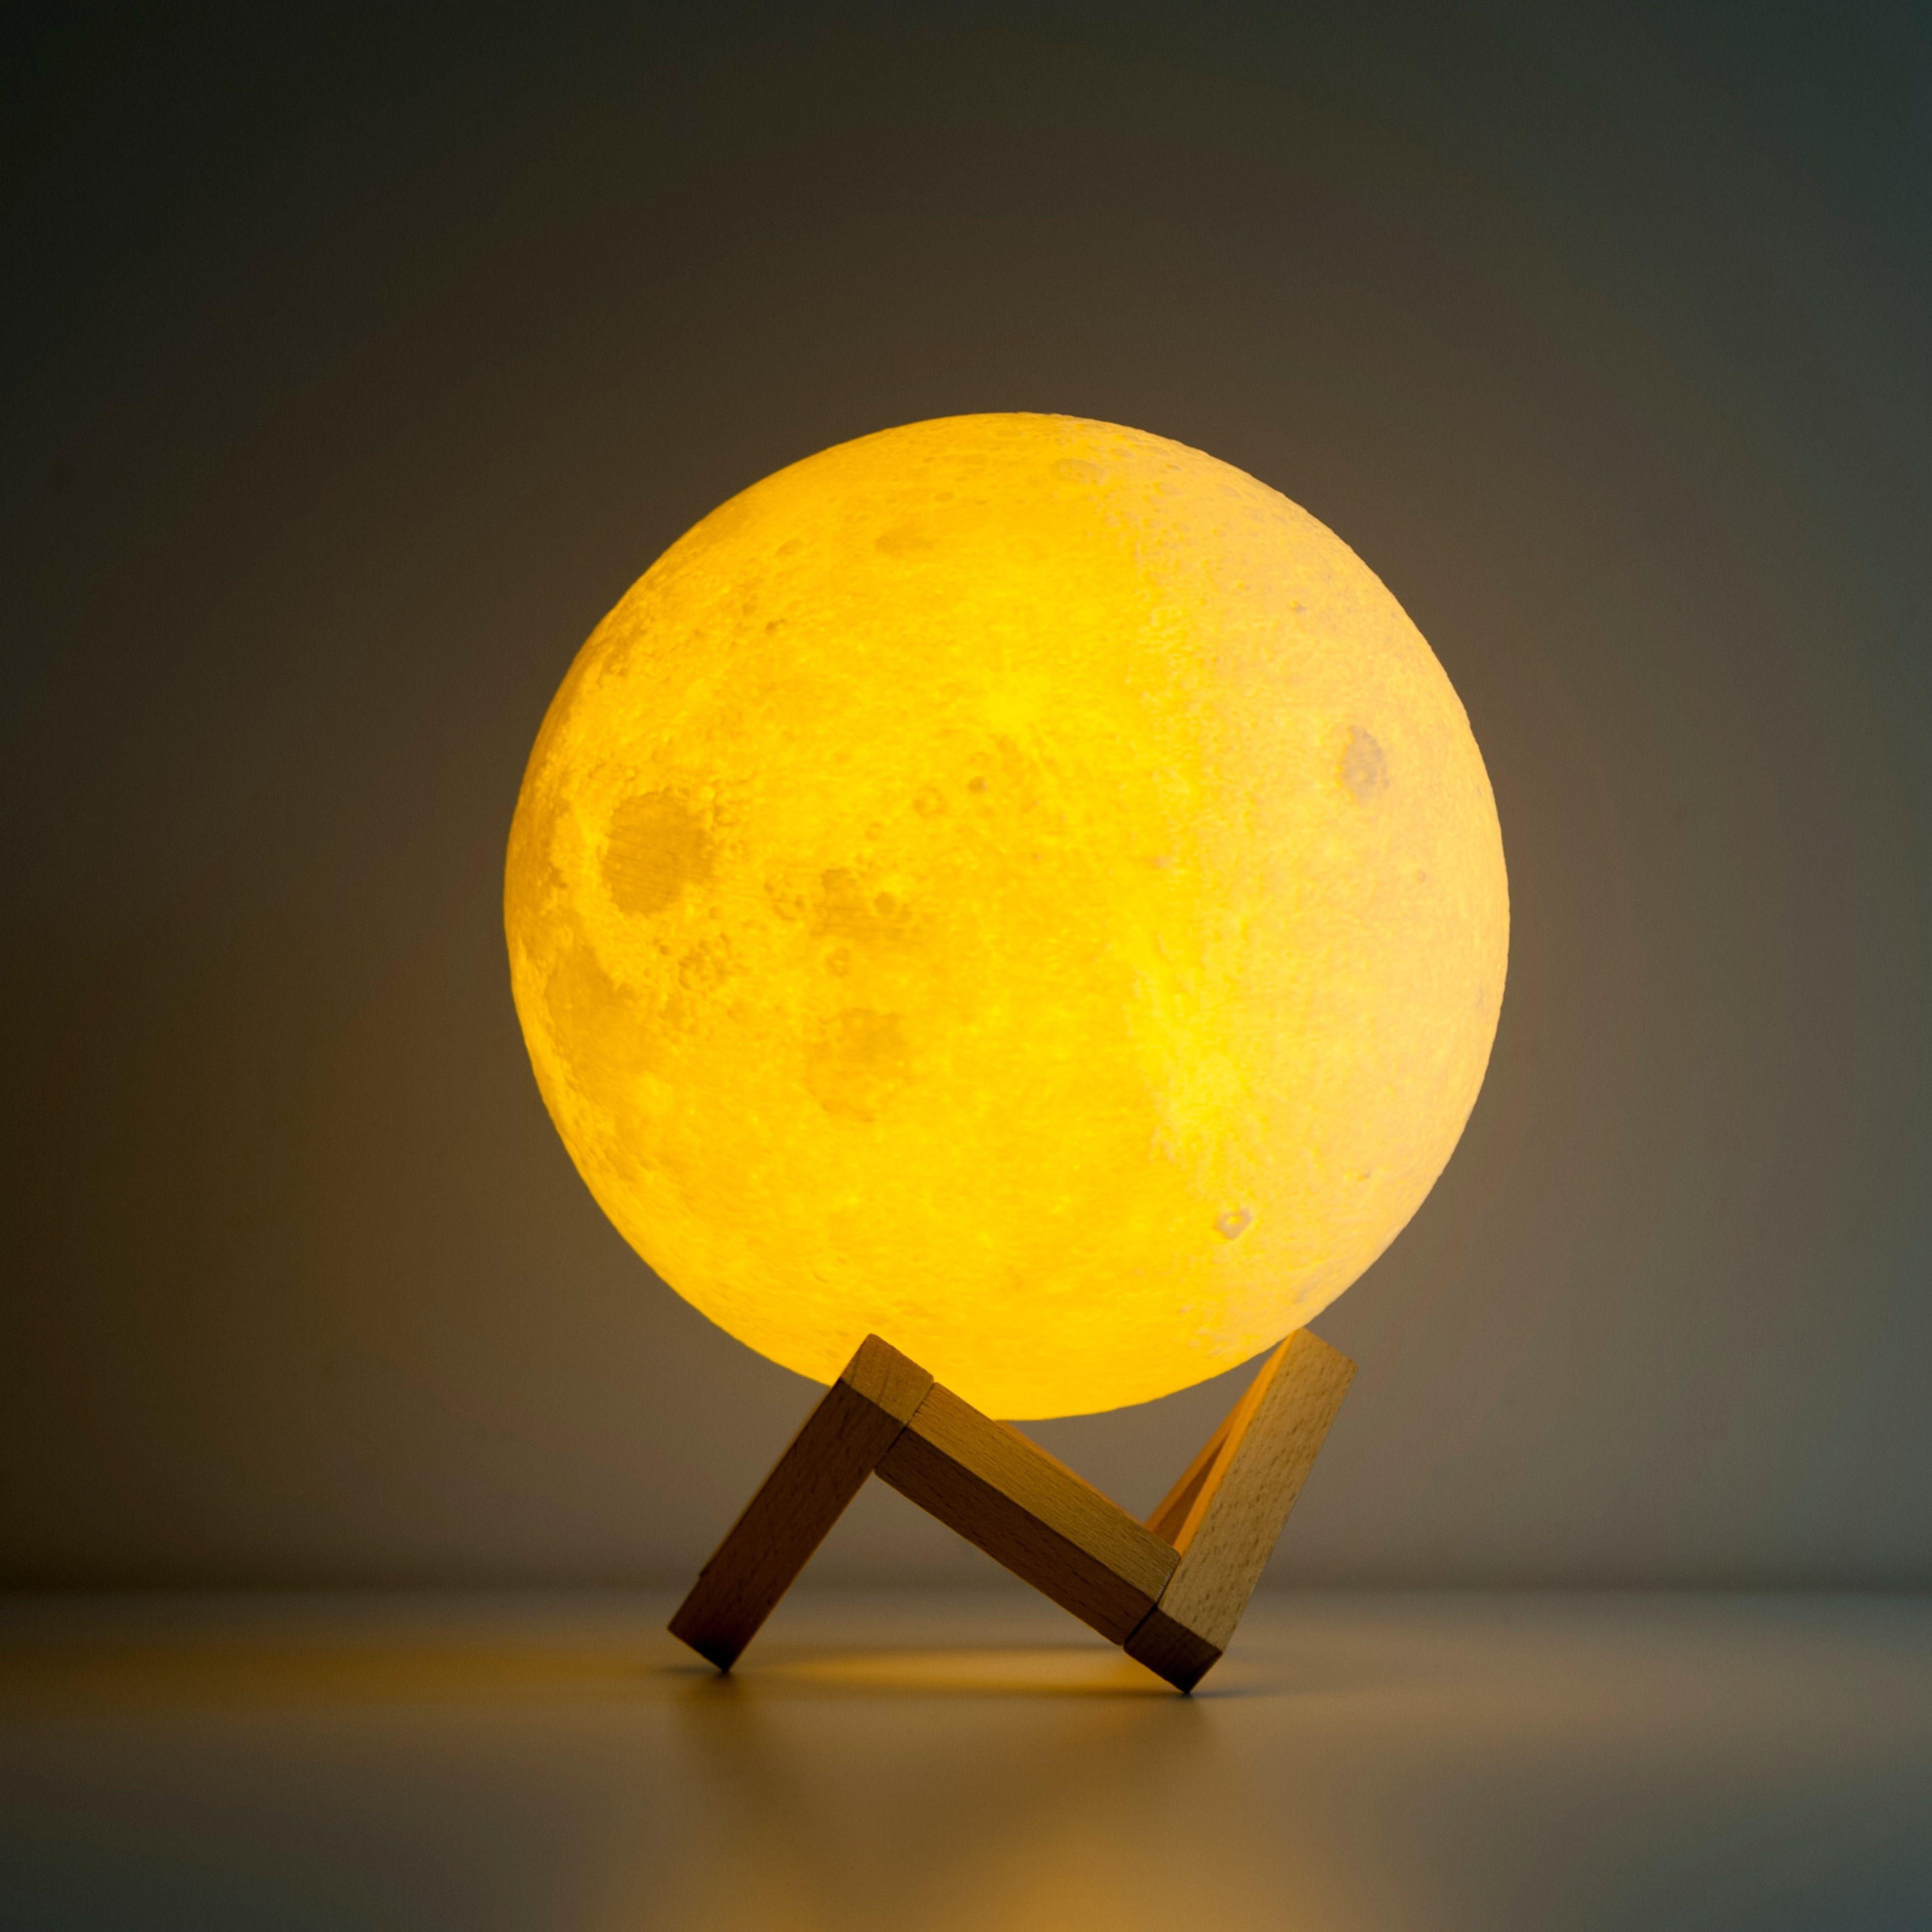 Mond Lampe Bild   Inredning